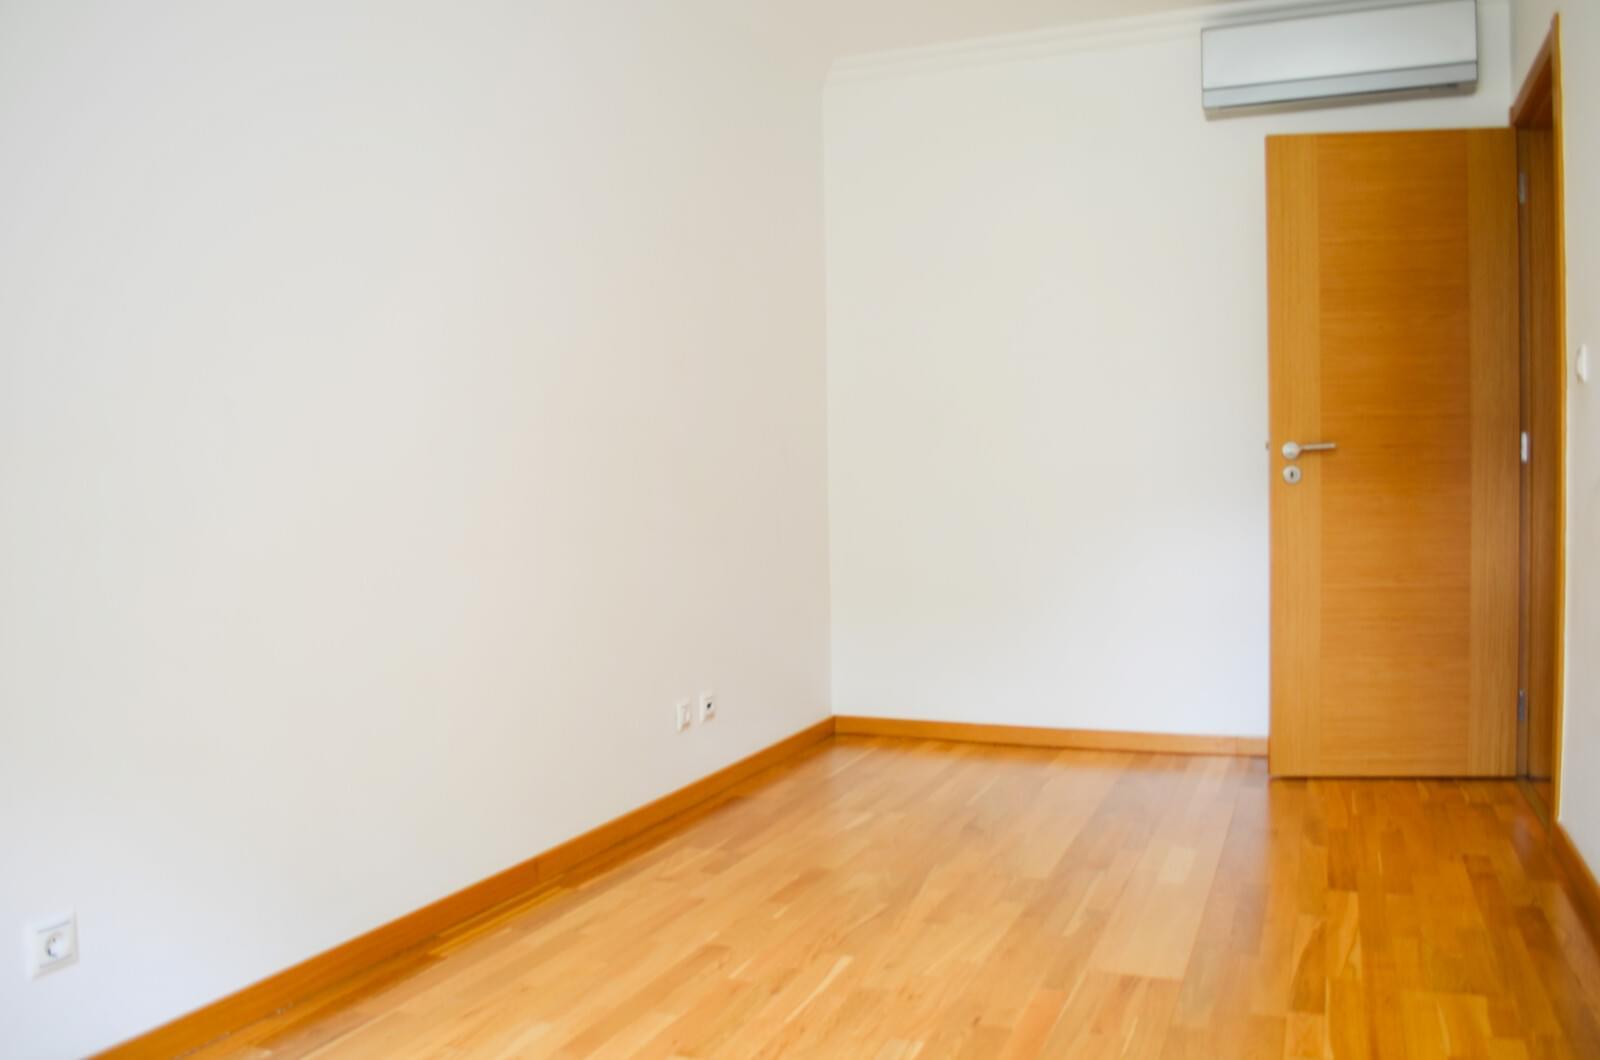 pf18839-apartamento-t2-lisboa-b83e65e4-67e7-4c0a-8044-53d34000b28d